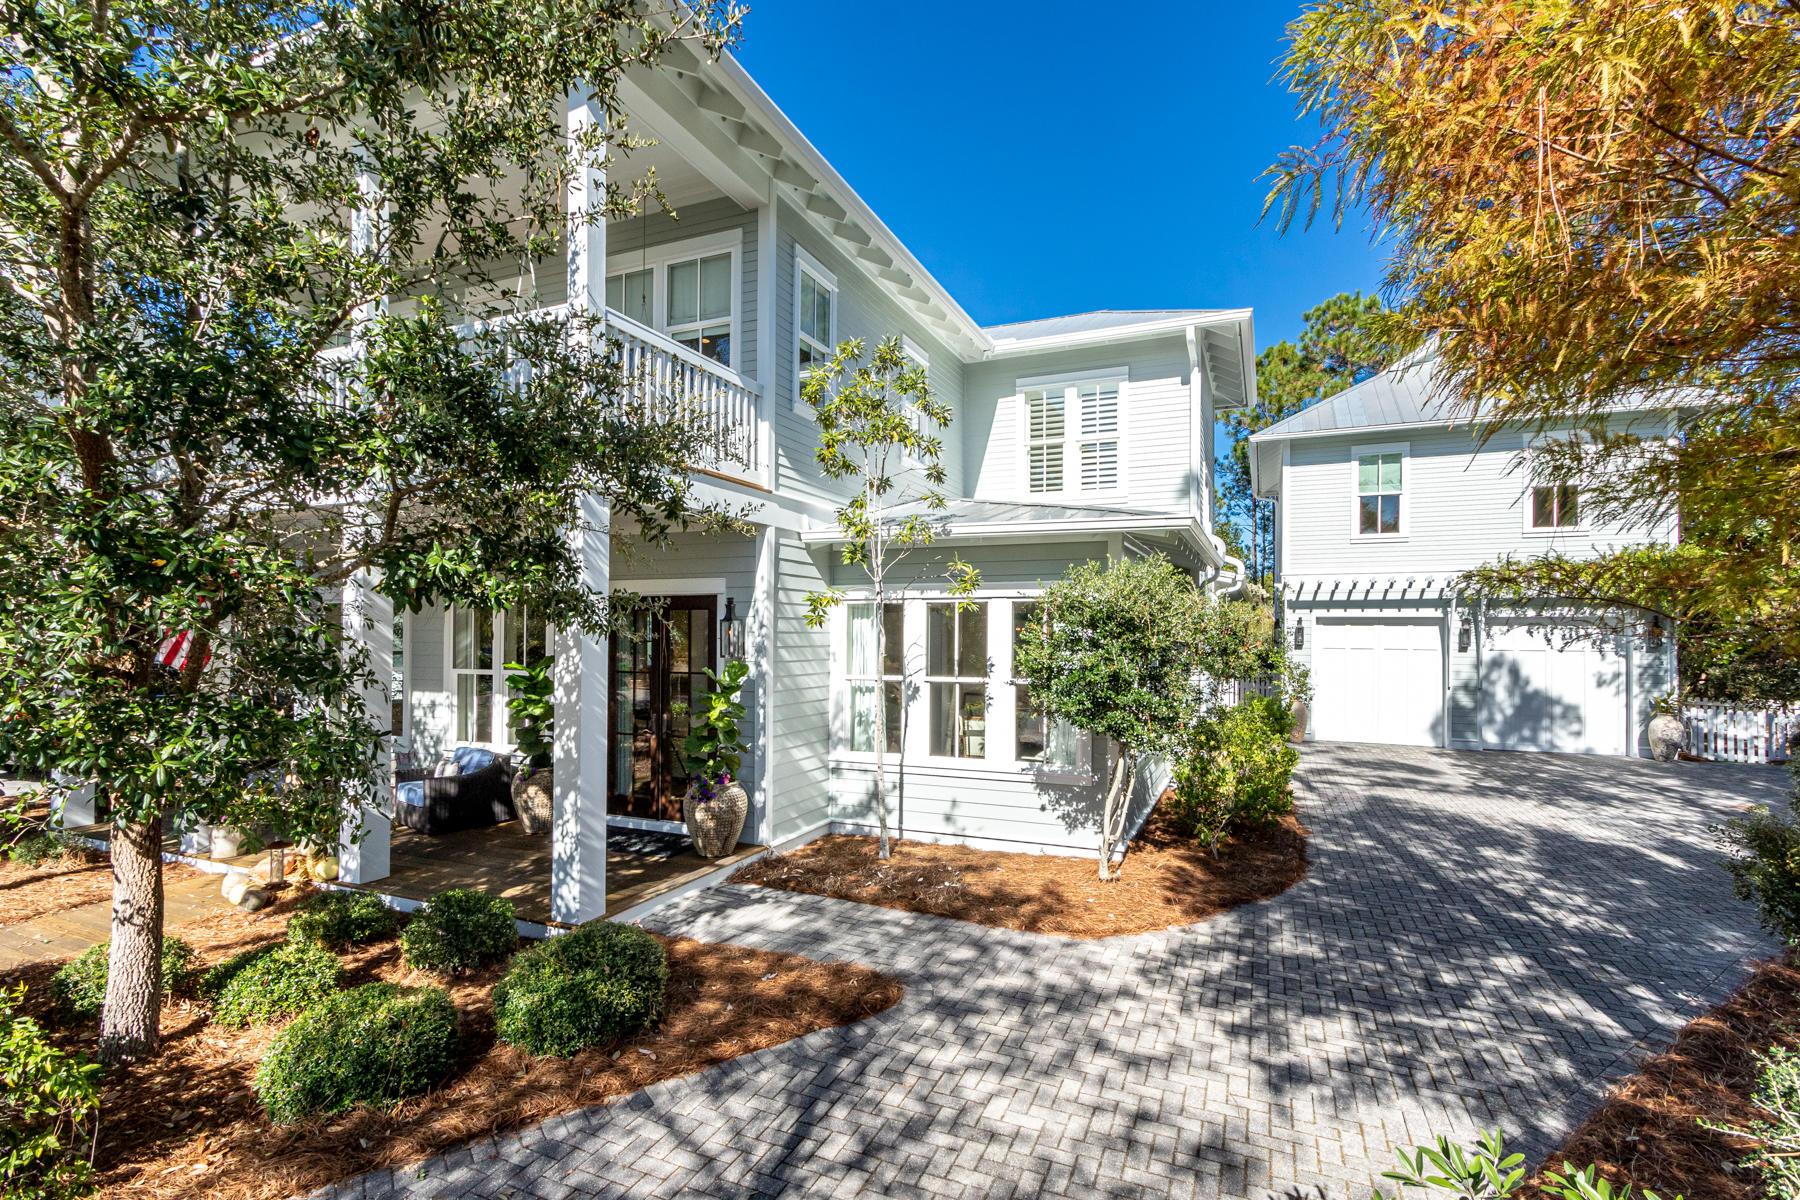 Photo of home for sale at 107 Sunflower, Santa Rosa Beach FL